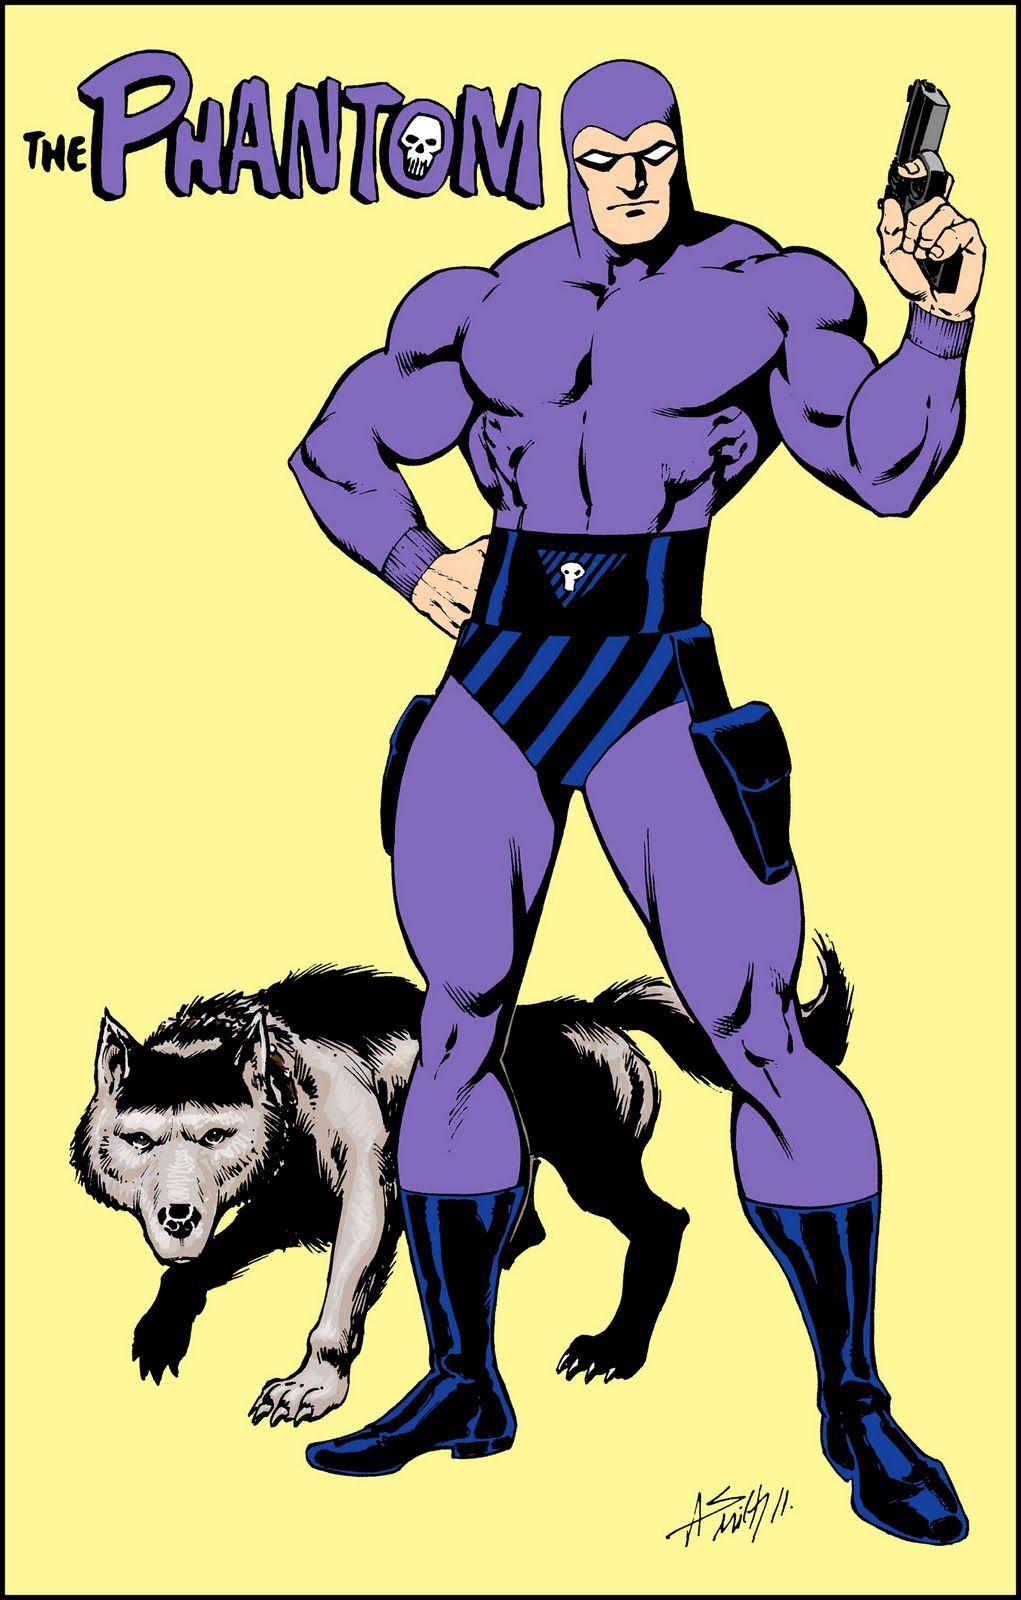 The Phantom   Phantom comics, Classic cartoon characters, Classic ...